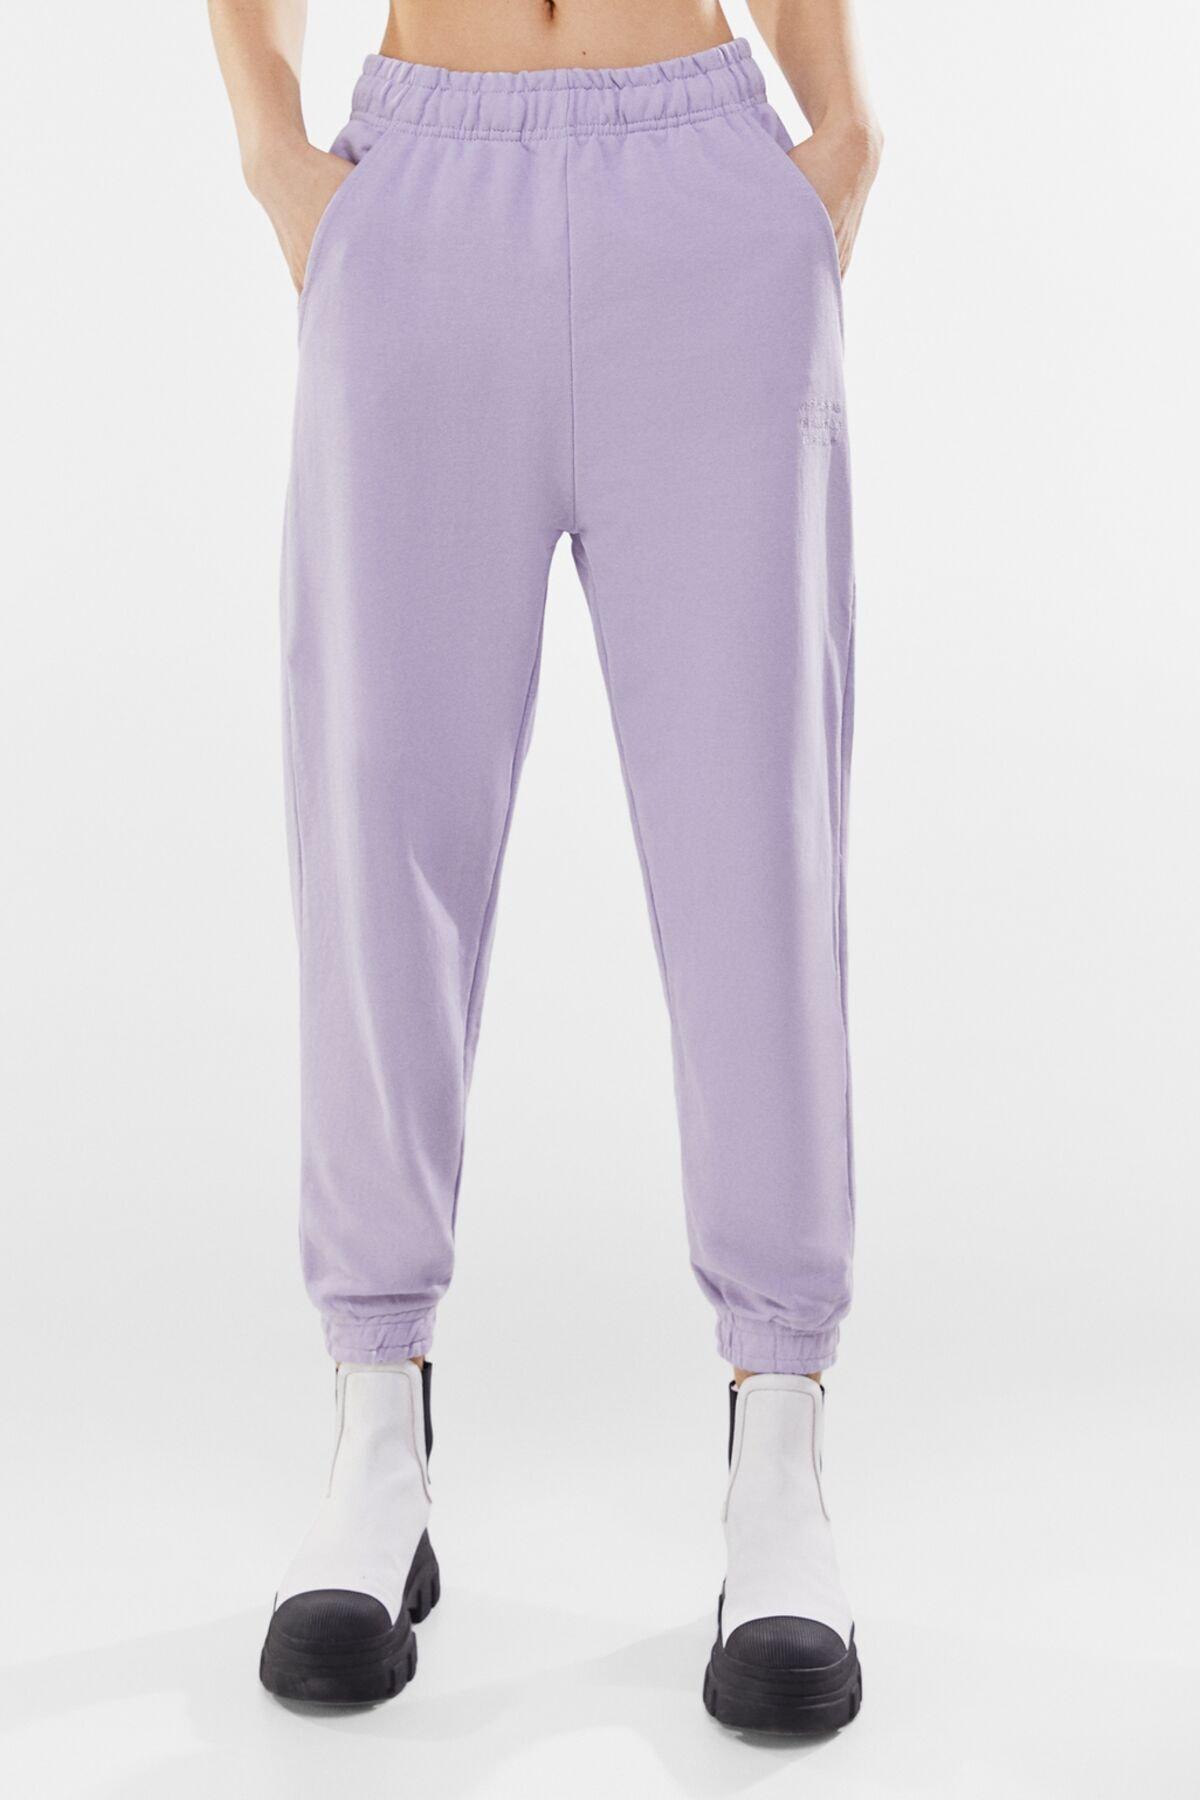 Bershka Kadın Mor Soluk Efektli Penye Jogging Fit Pantolon 00240478